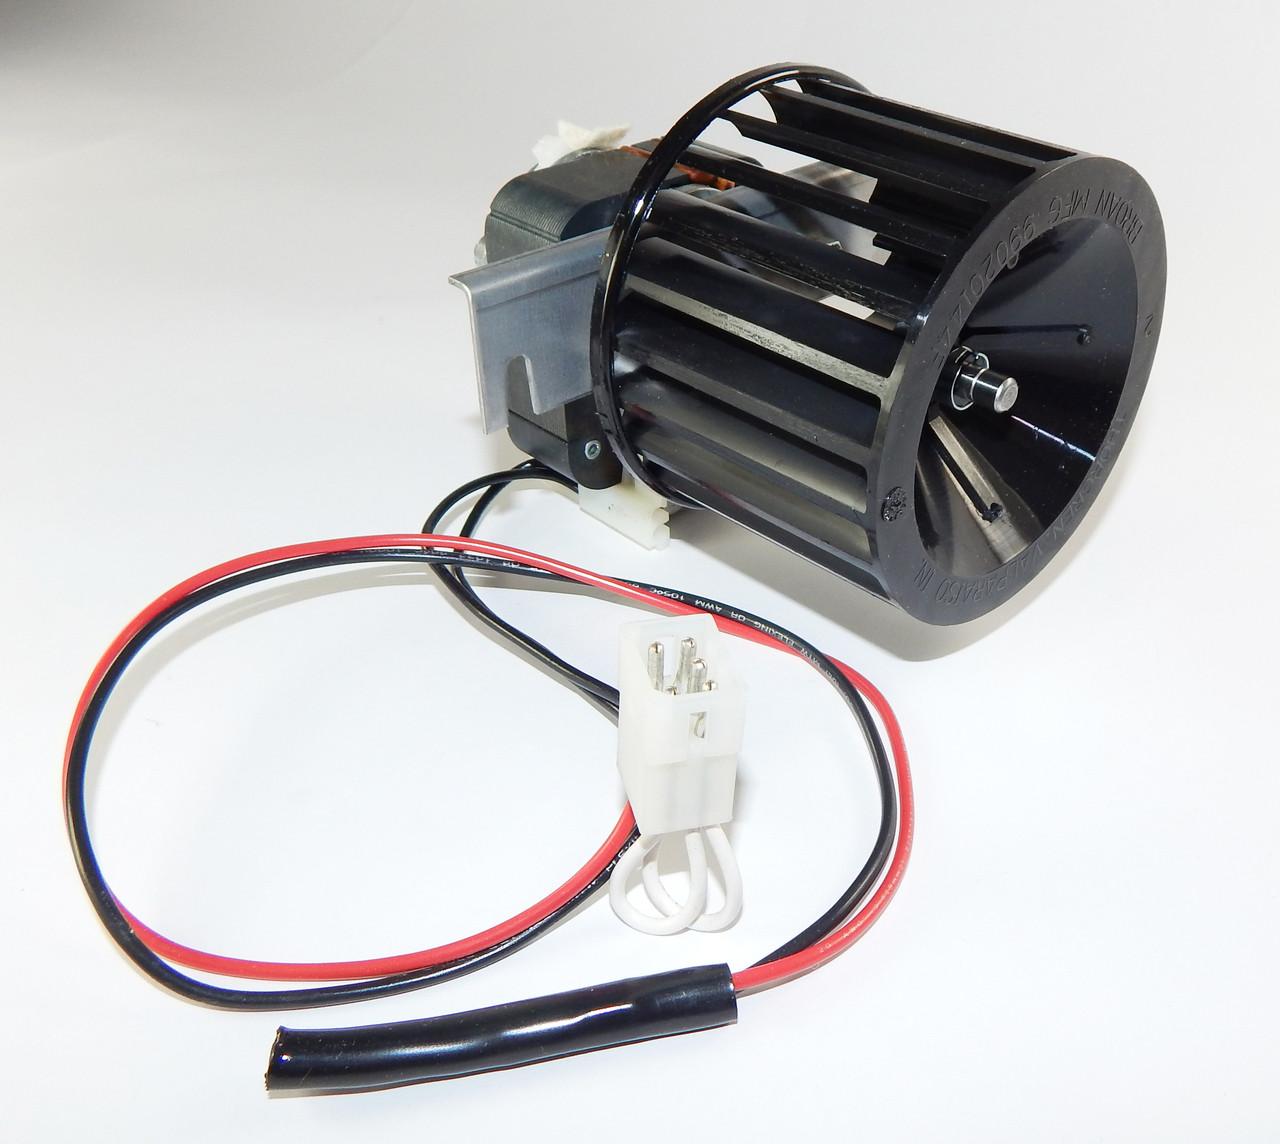 97006223__73009.1494425352.1280.1280?c=2 nutone broan replacement fan motors electric motor warehouse Vent a Hood Wiring Diagram at honlapkeszites.co